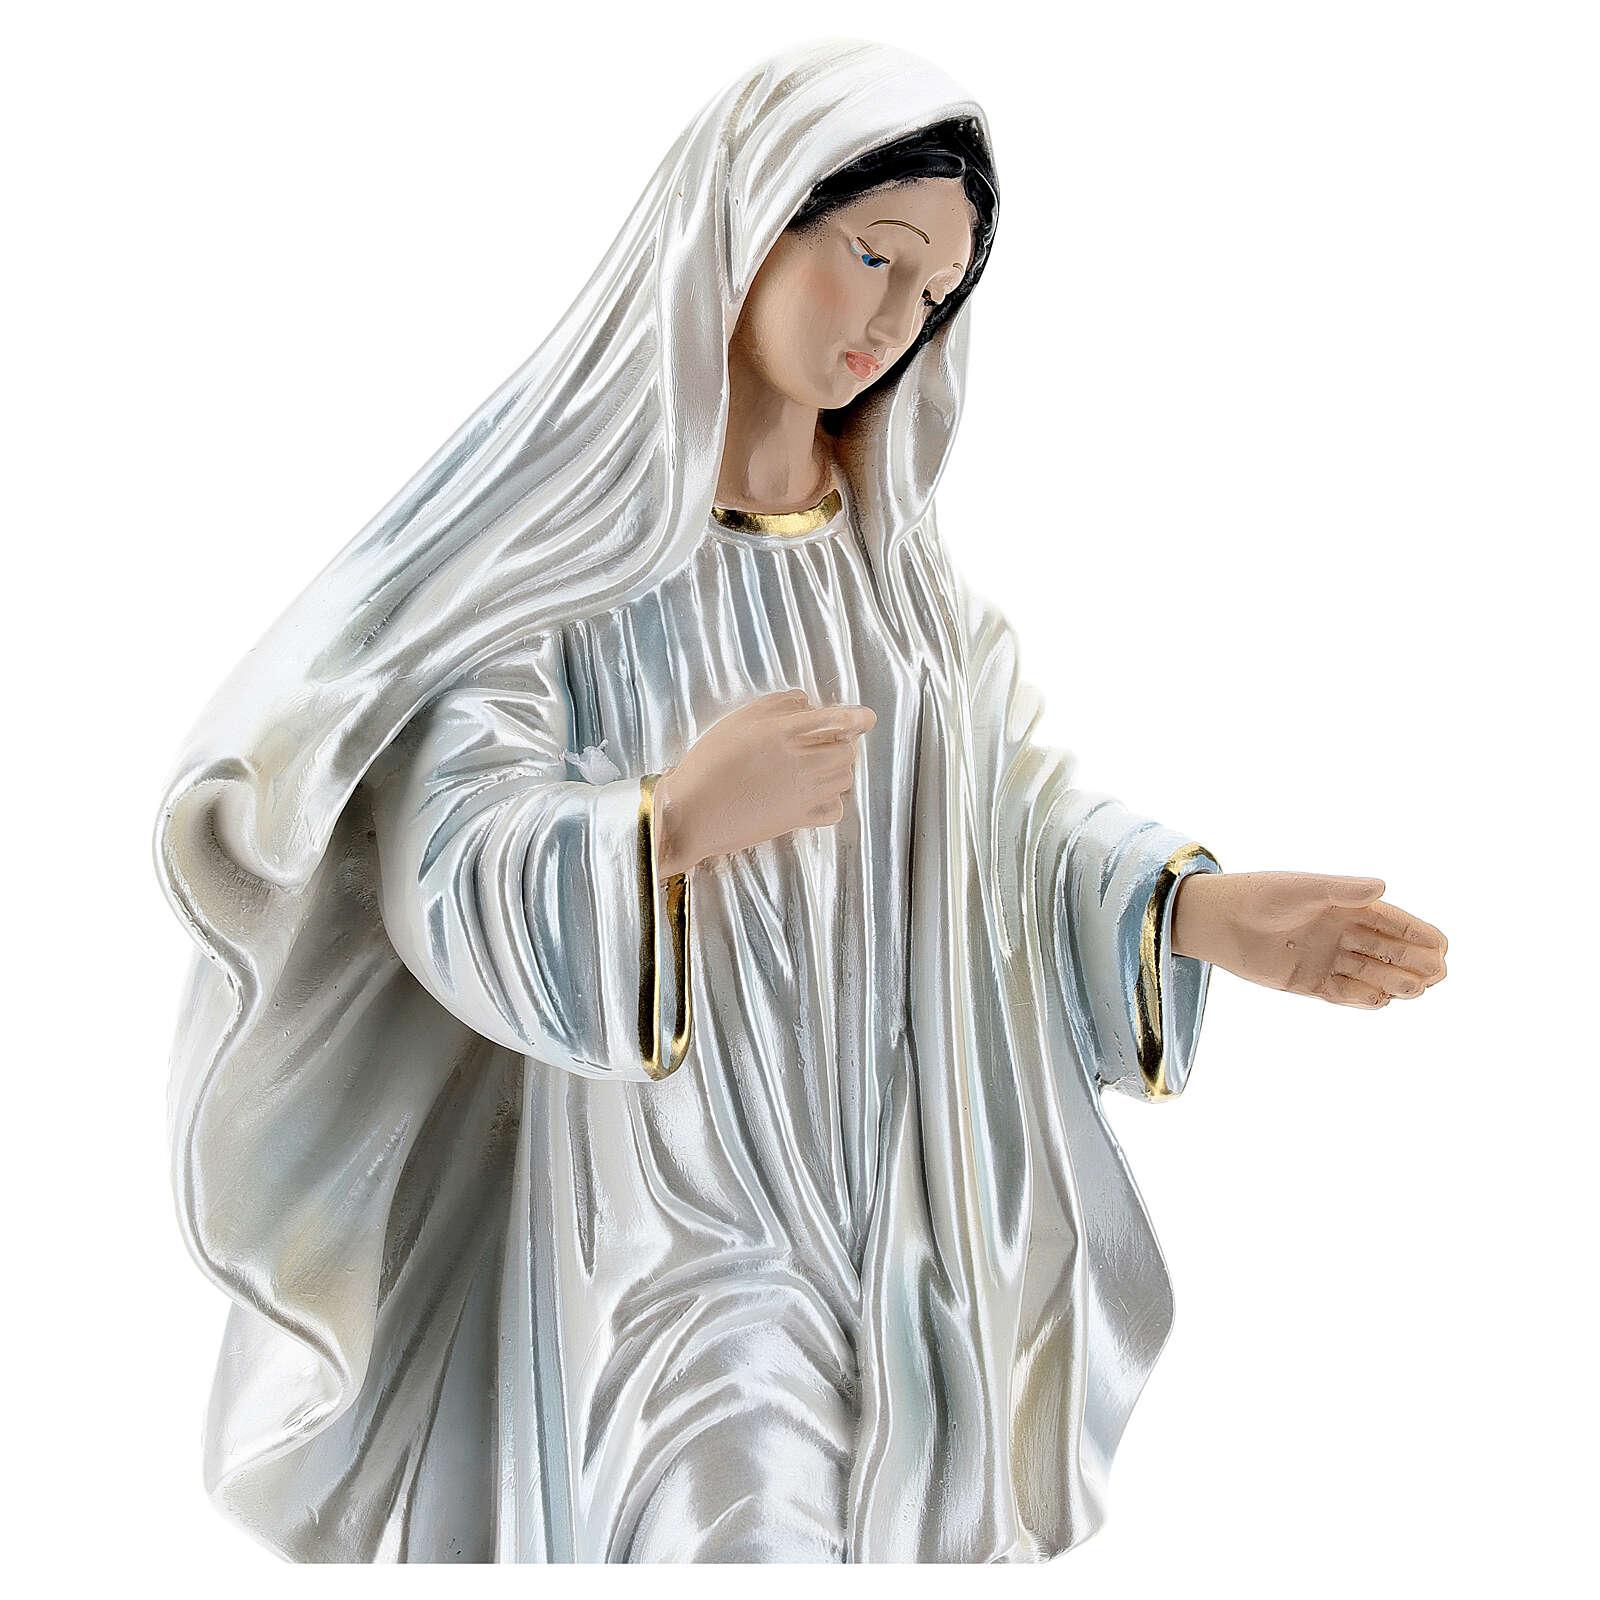 Statua gesso madreperlato Madonna di Medjugorje 35 cm 4